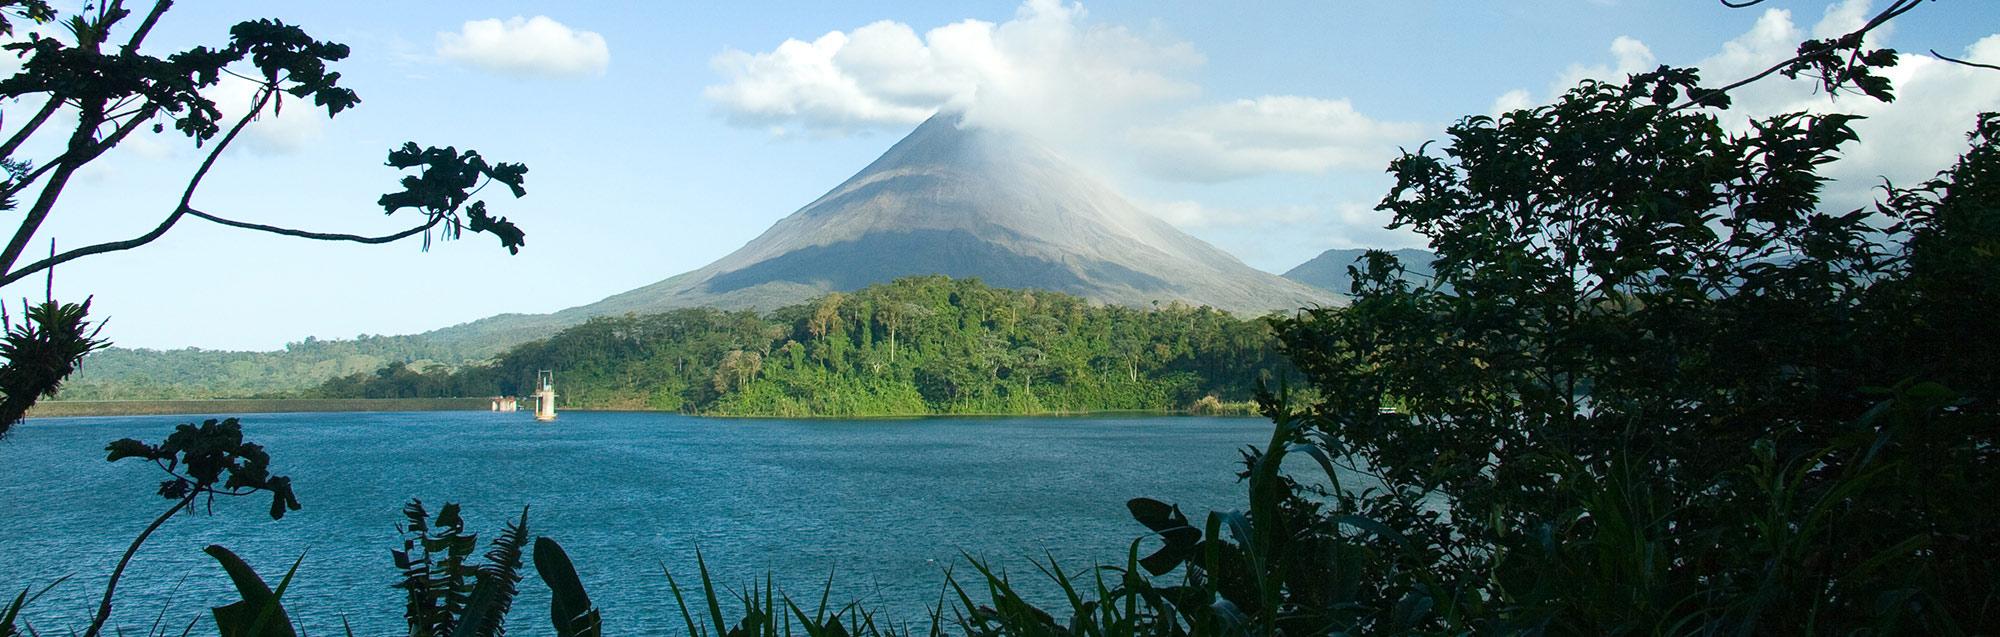 Bildungsurlaub Costa Rica